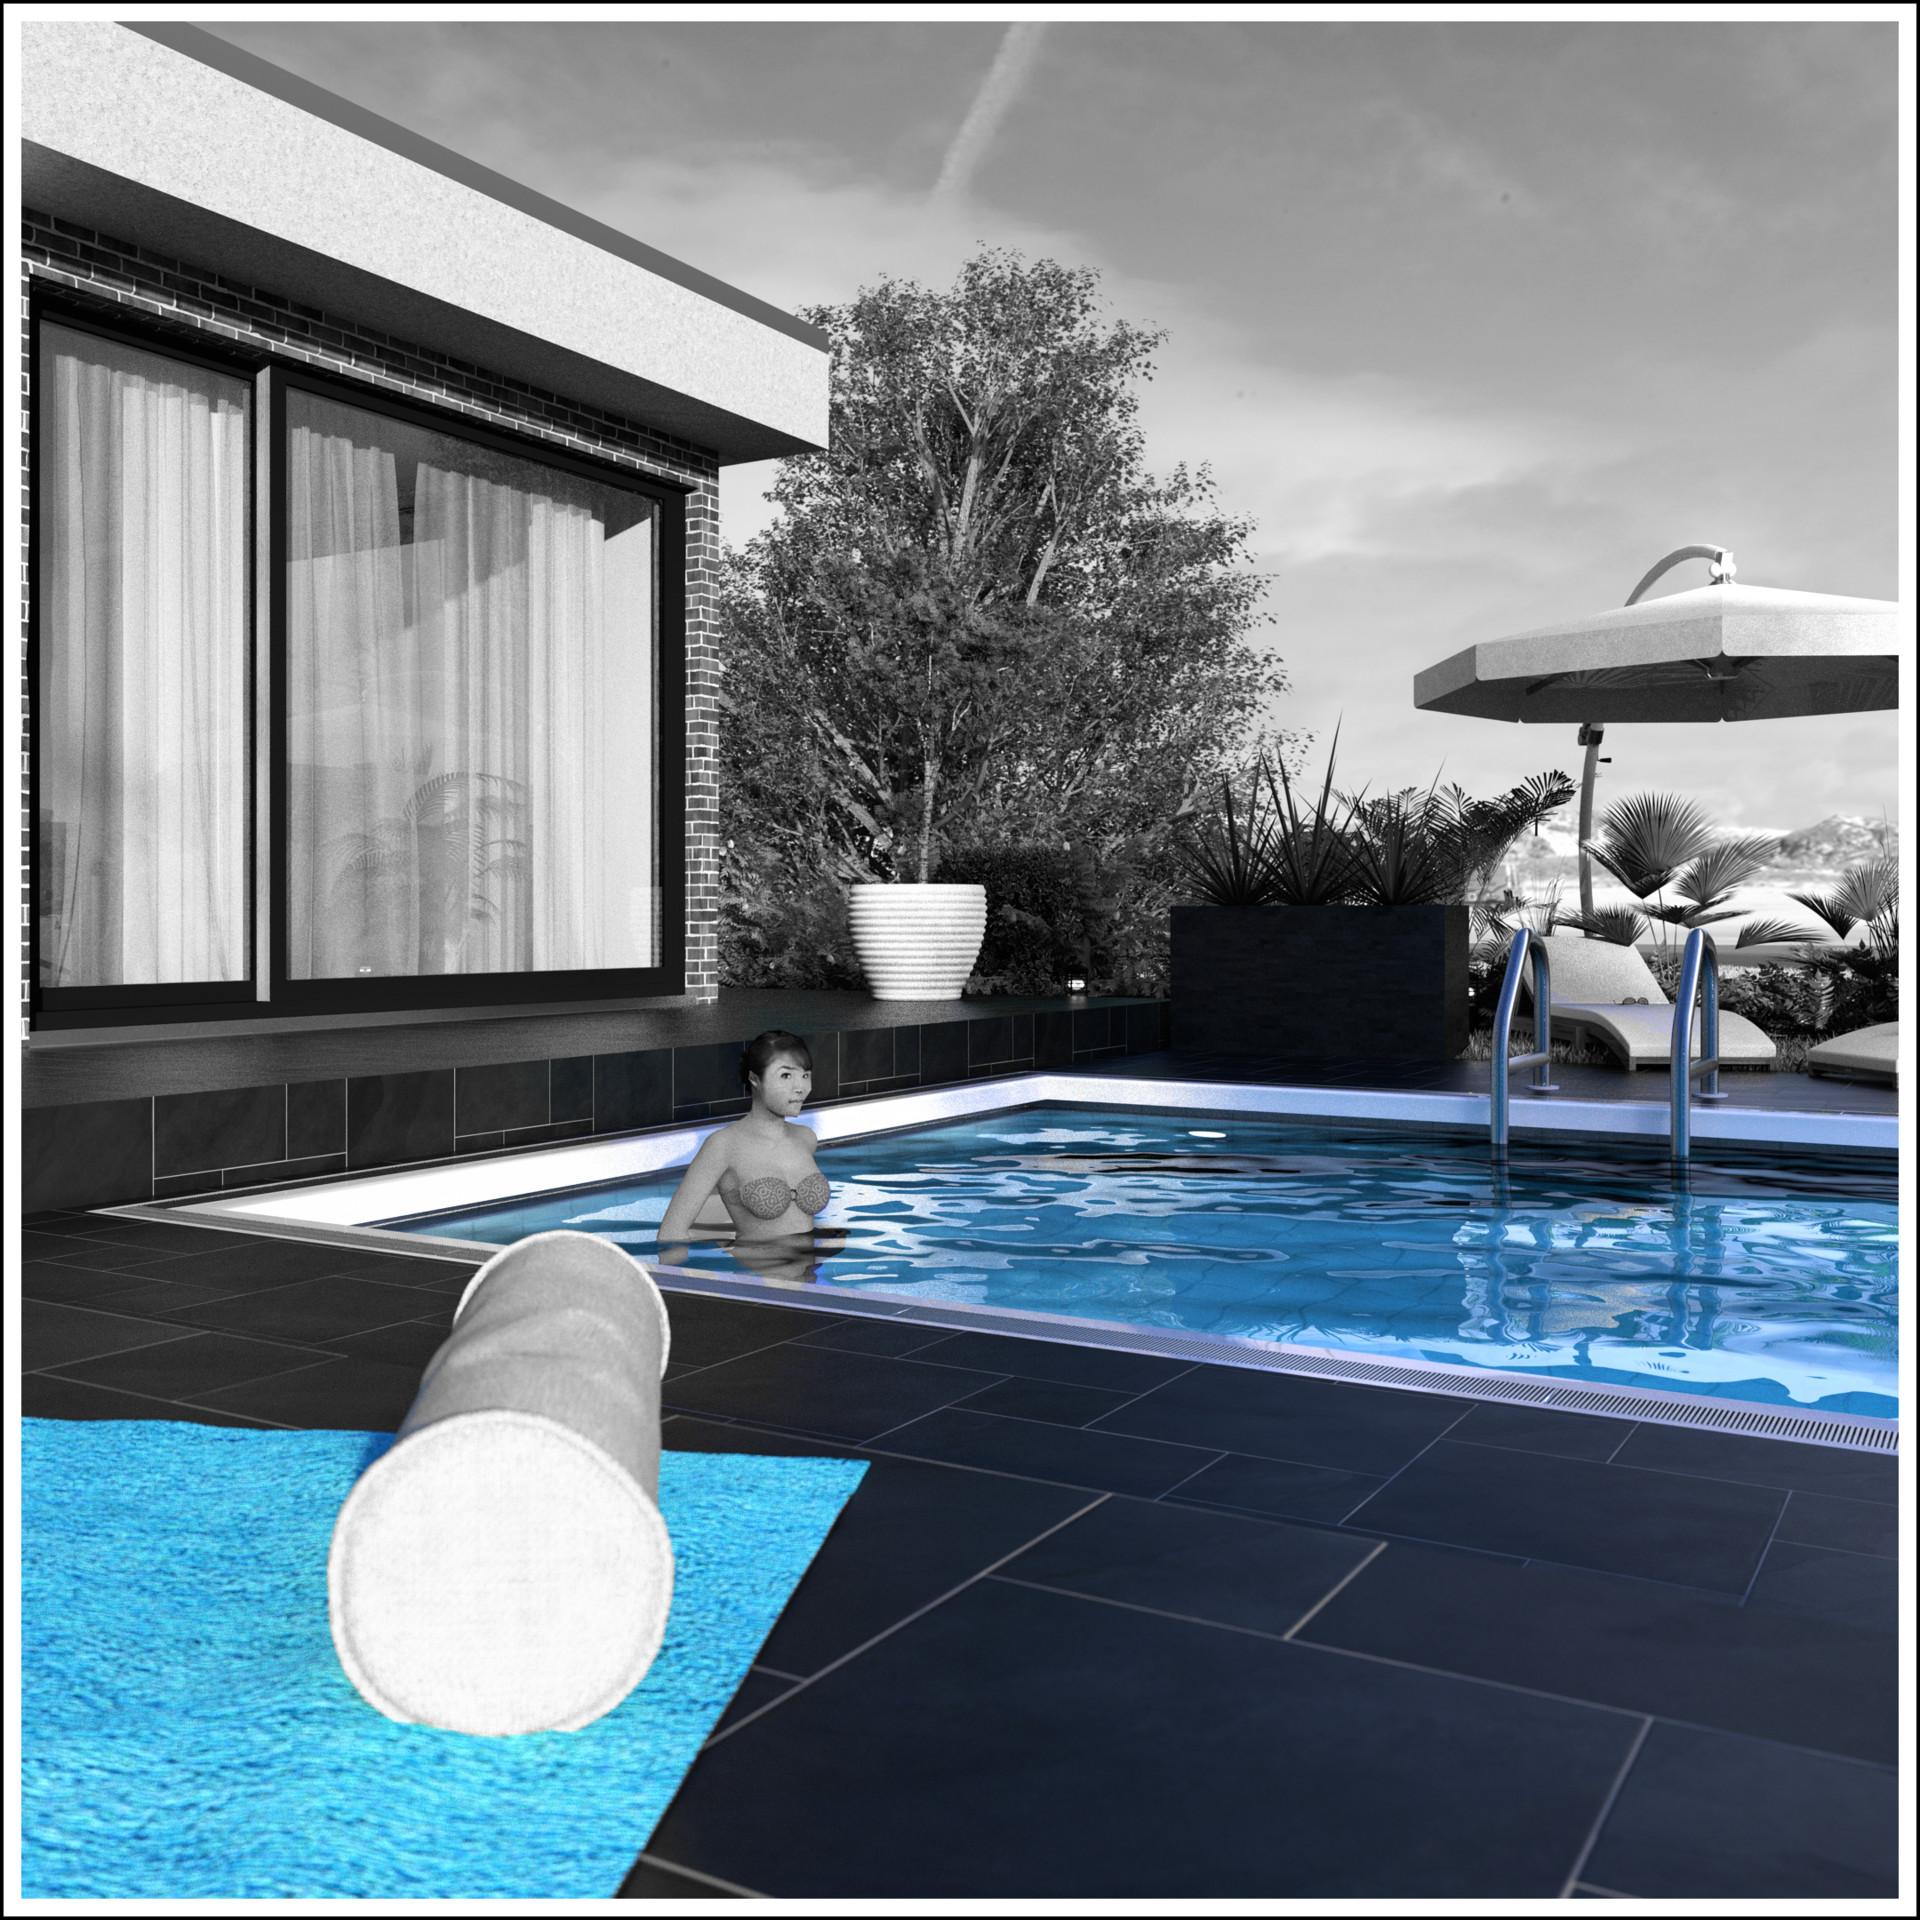 Duane kemp 15 bungalow poolside scene 63 splash white